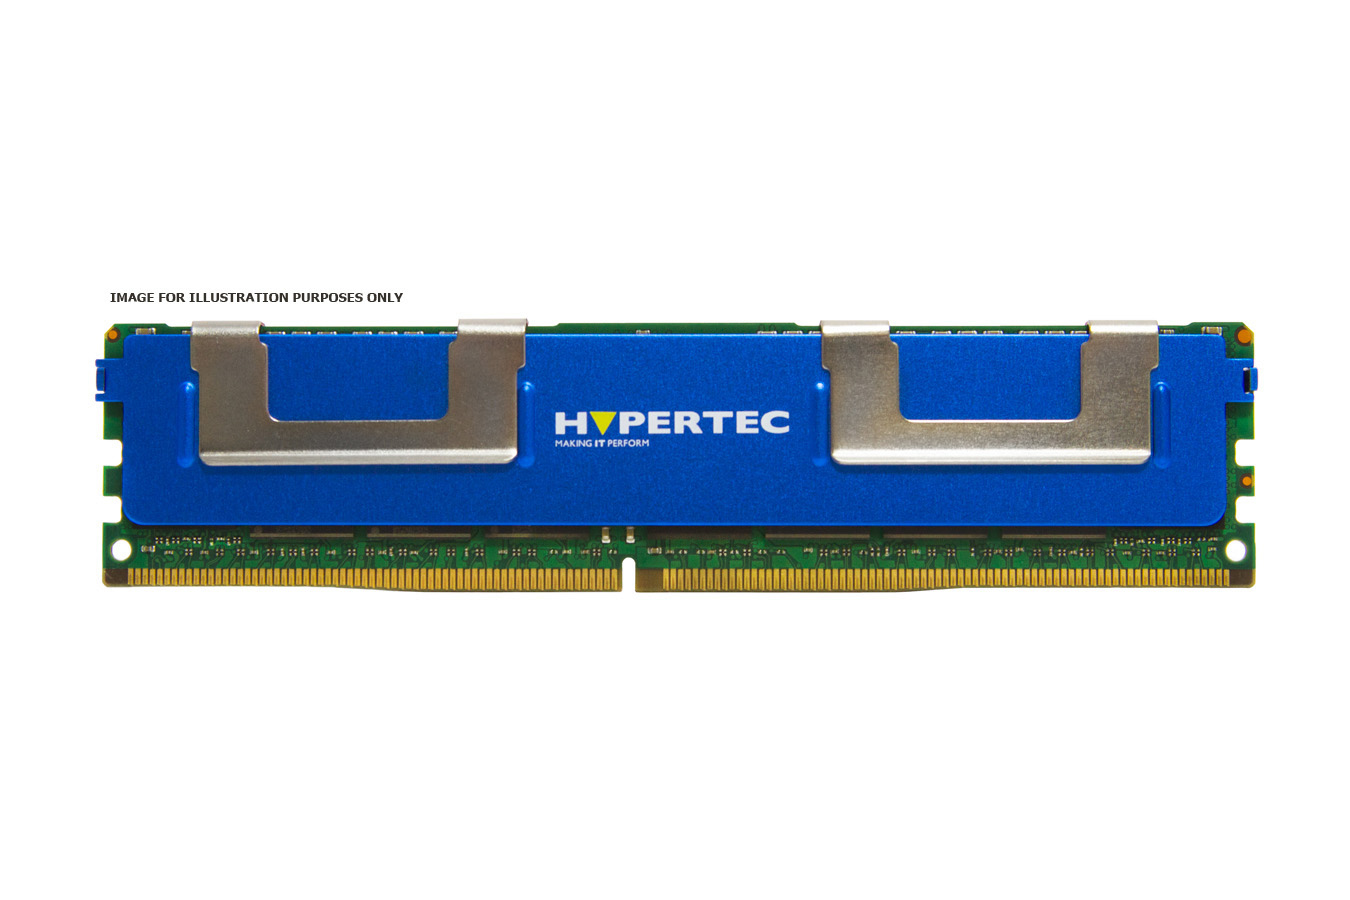 Hypertec FX622AA-HY 8GB DDR3 1333MHz ECC memory module